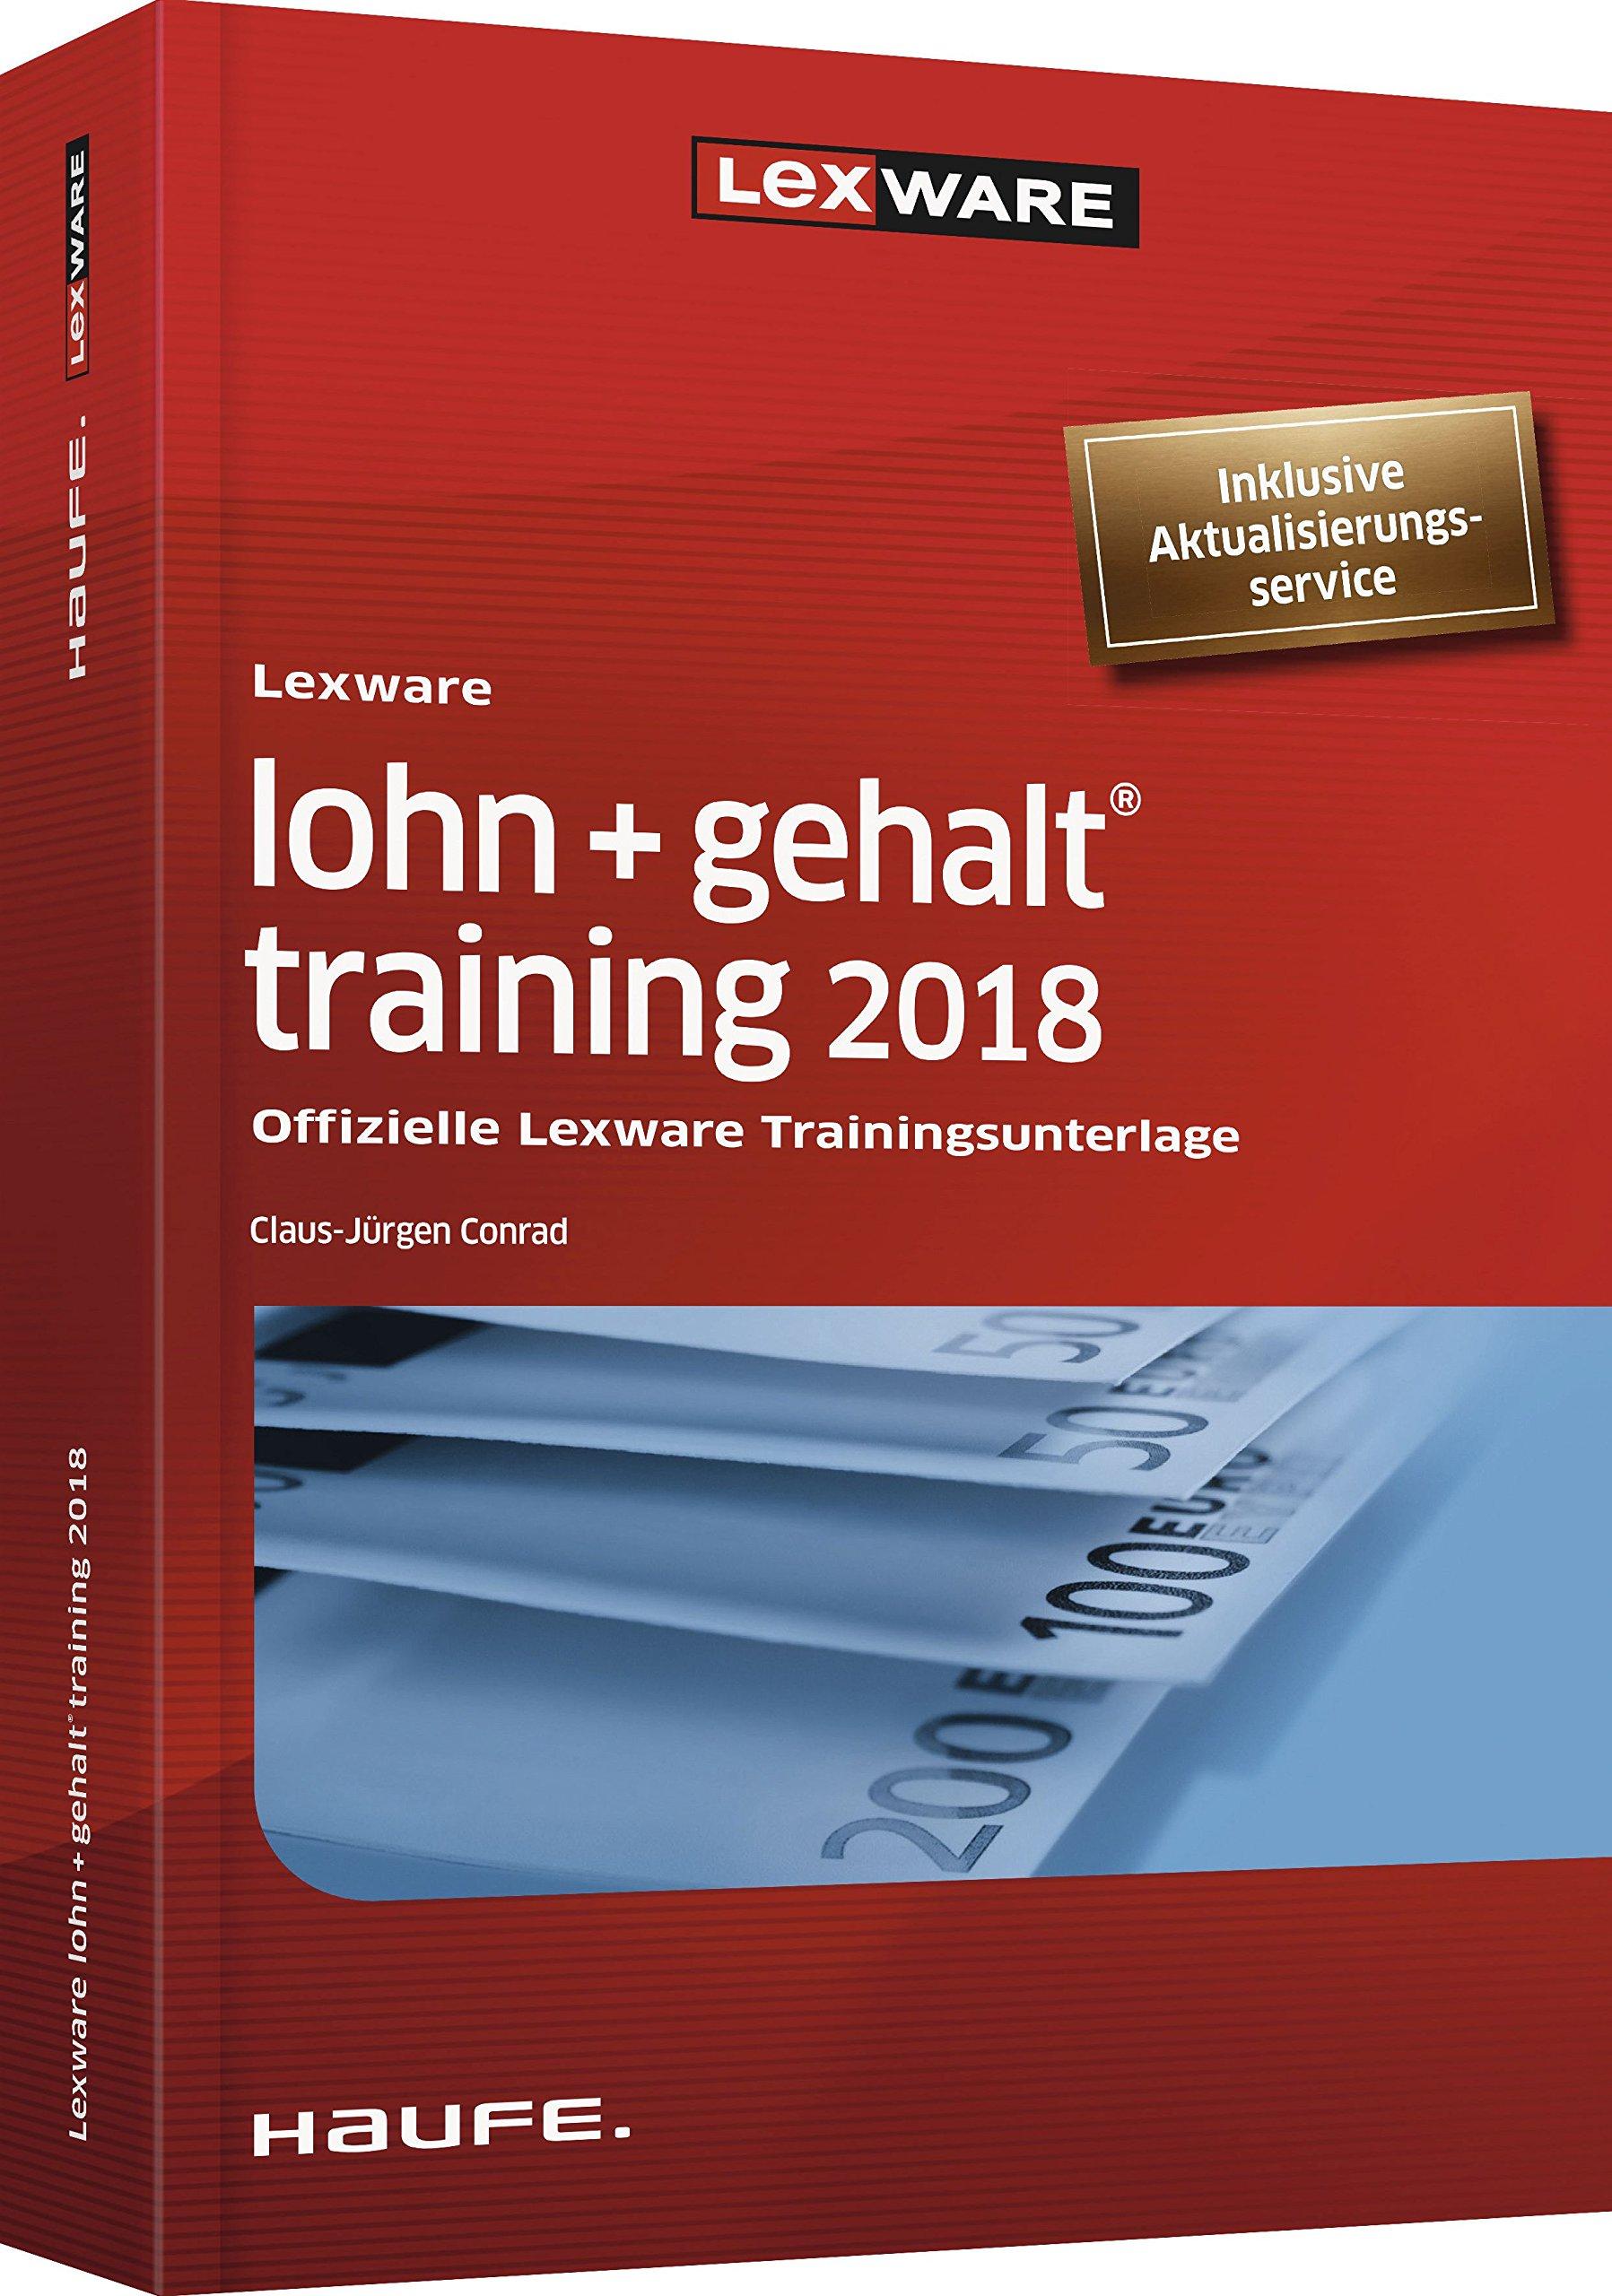 Lexware lohn+gehalt training 2018 - inkl. Arbeitshilfen online: Offizielle Lexware Trainingsunterlage